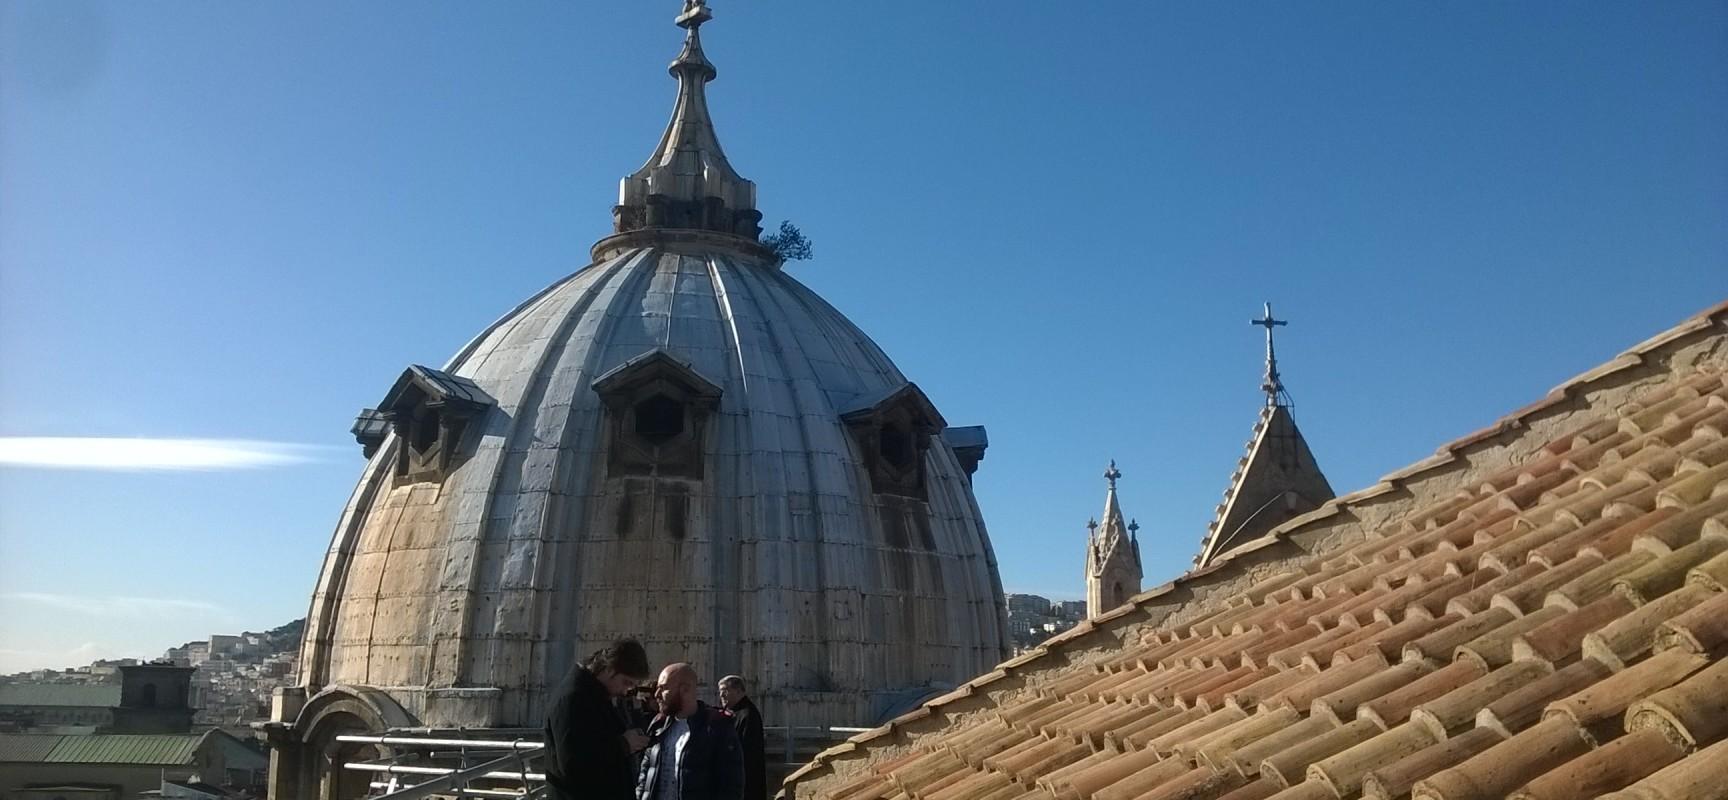 Duomo Napoli, a spasso tra scoperte e panorama mozzafiato